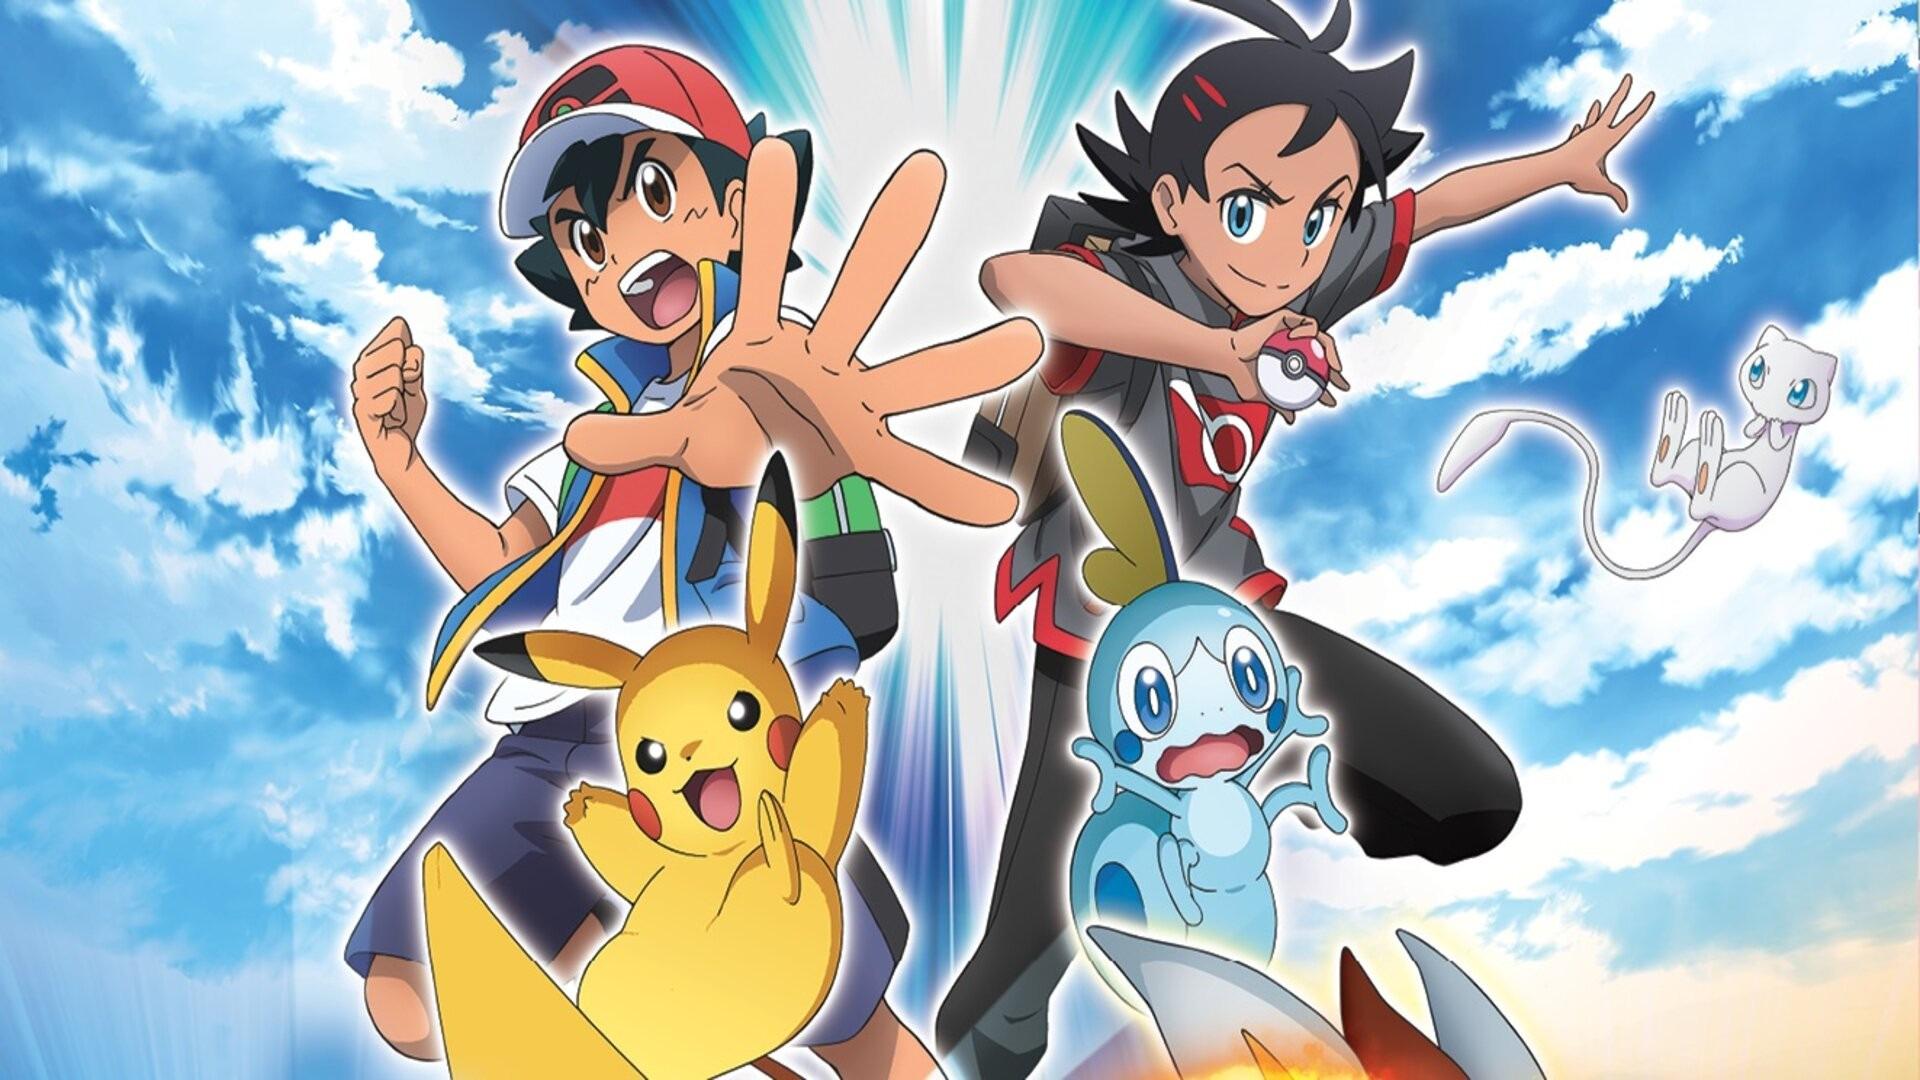 Anime Pokémon the Series